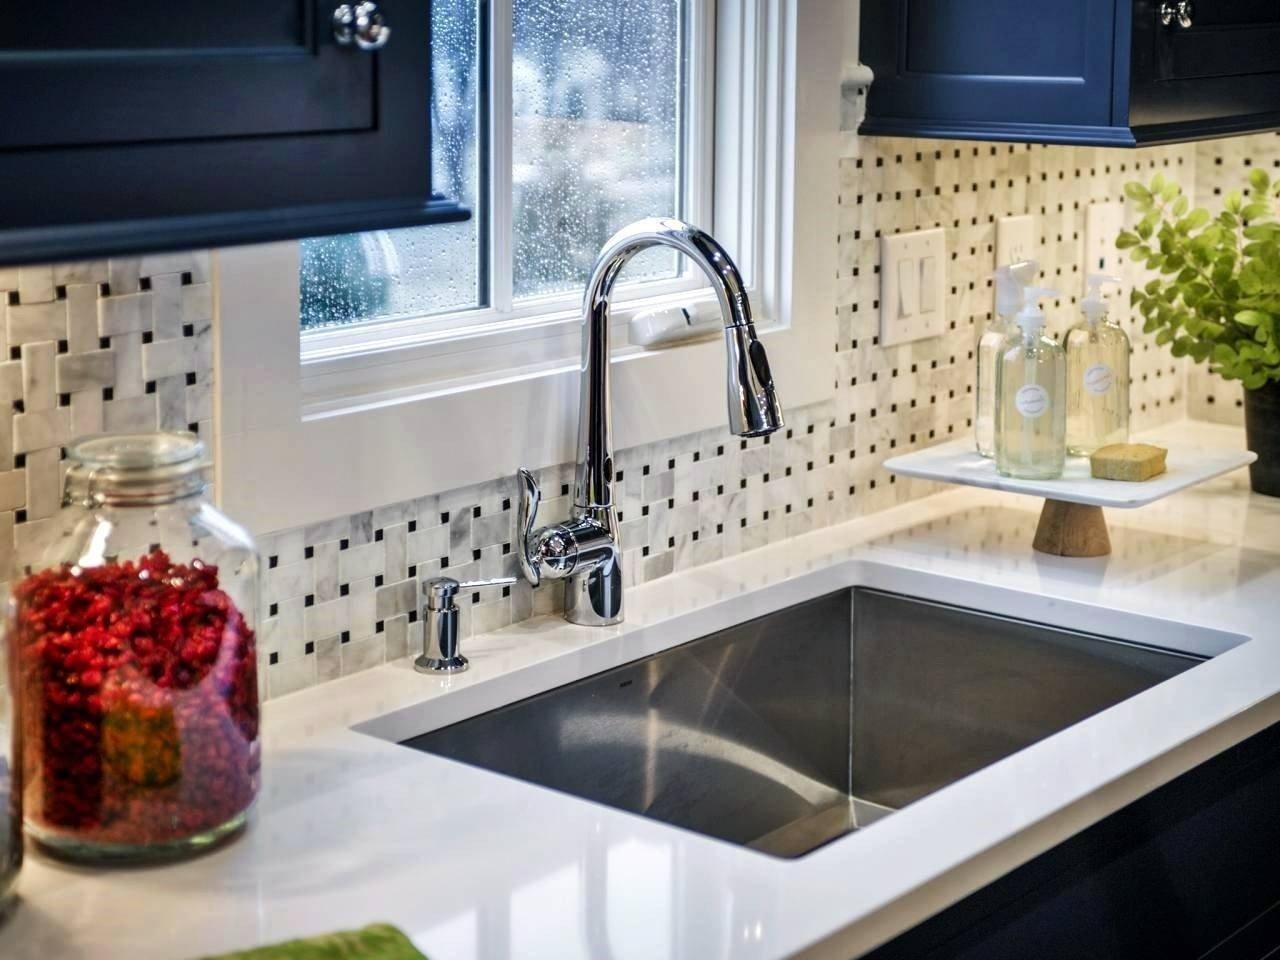 10 Fantastic Backsplash Ideas On A Budget backsplash ideas inexpensive home design 2021